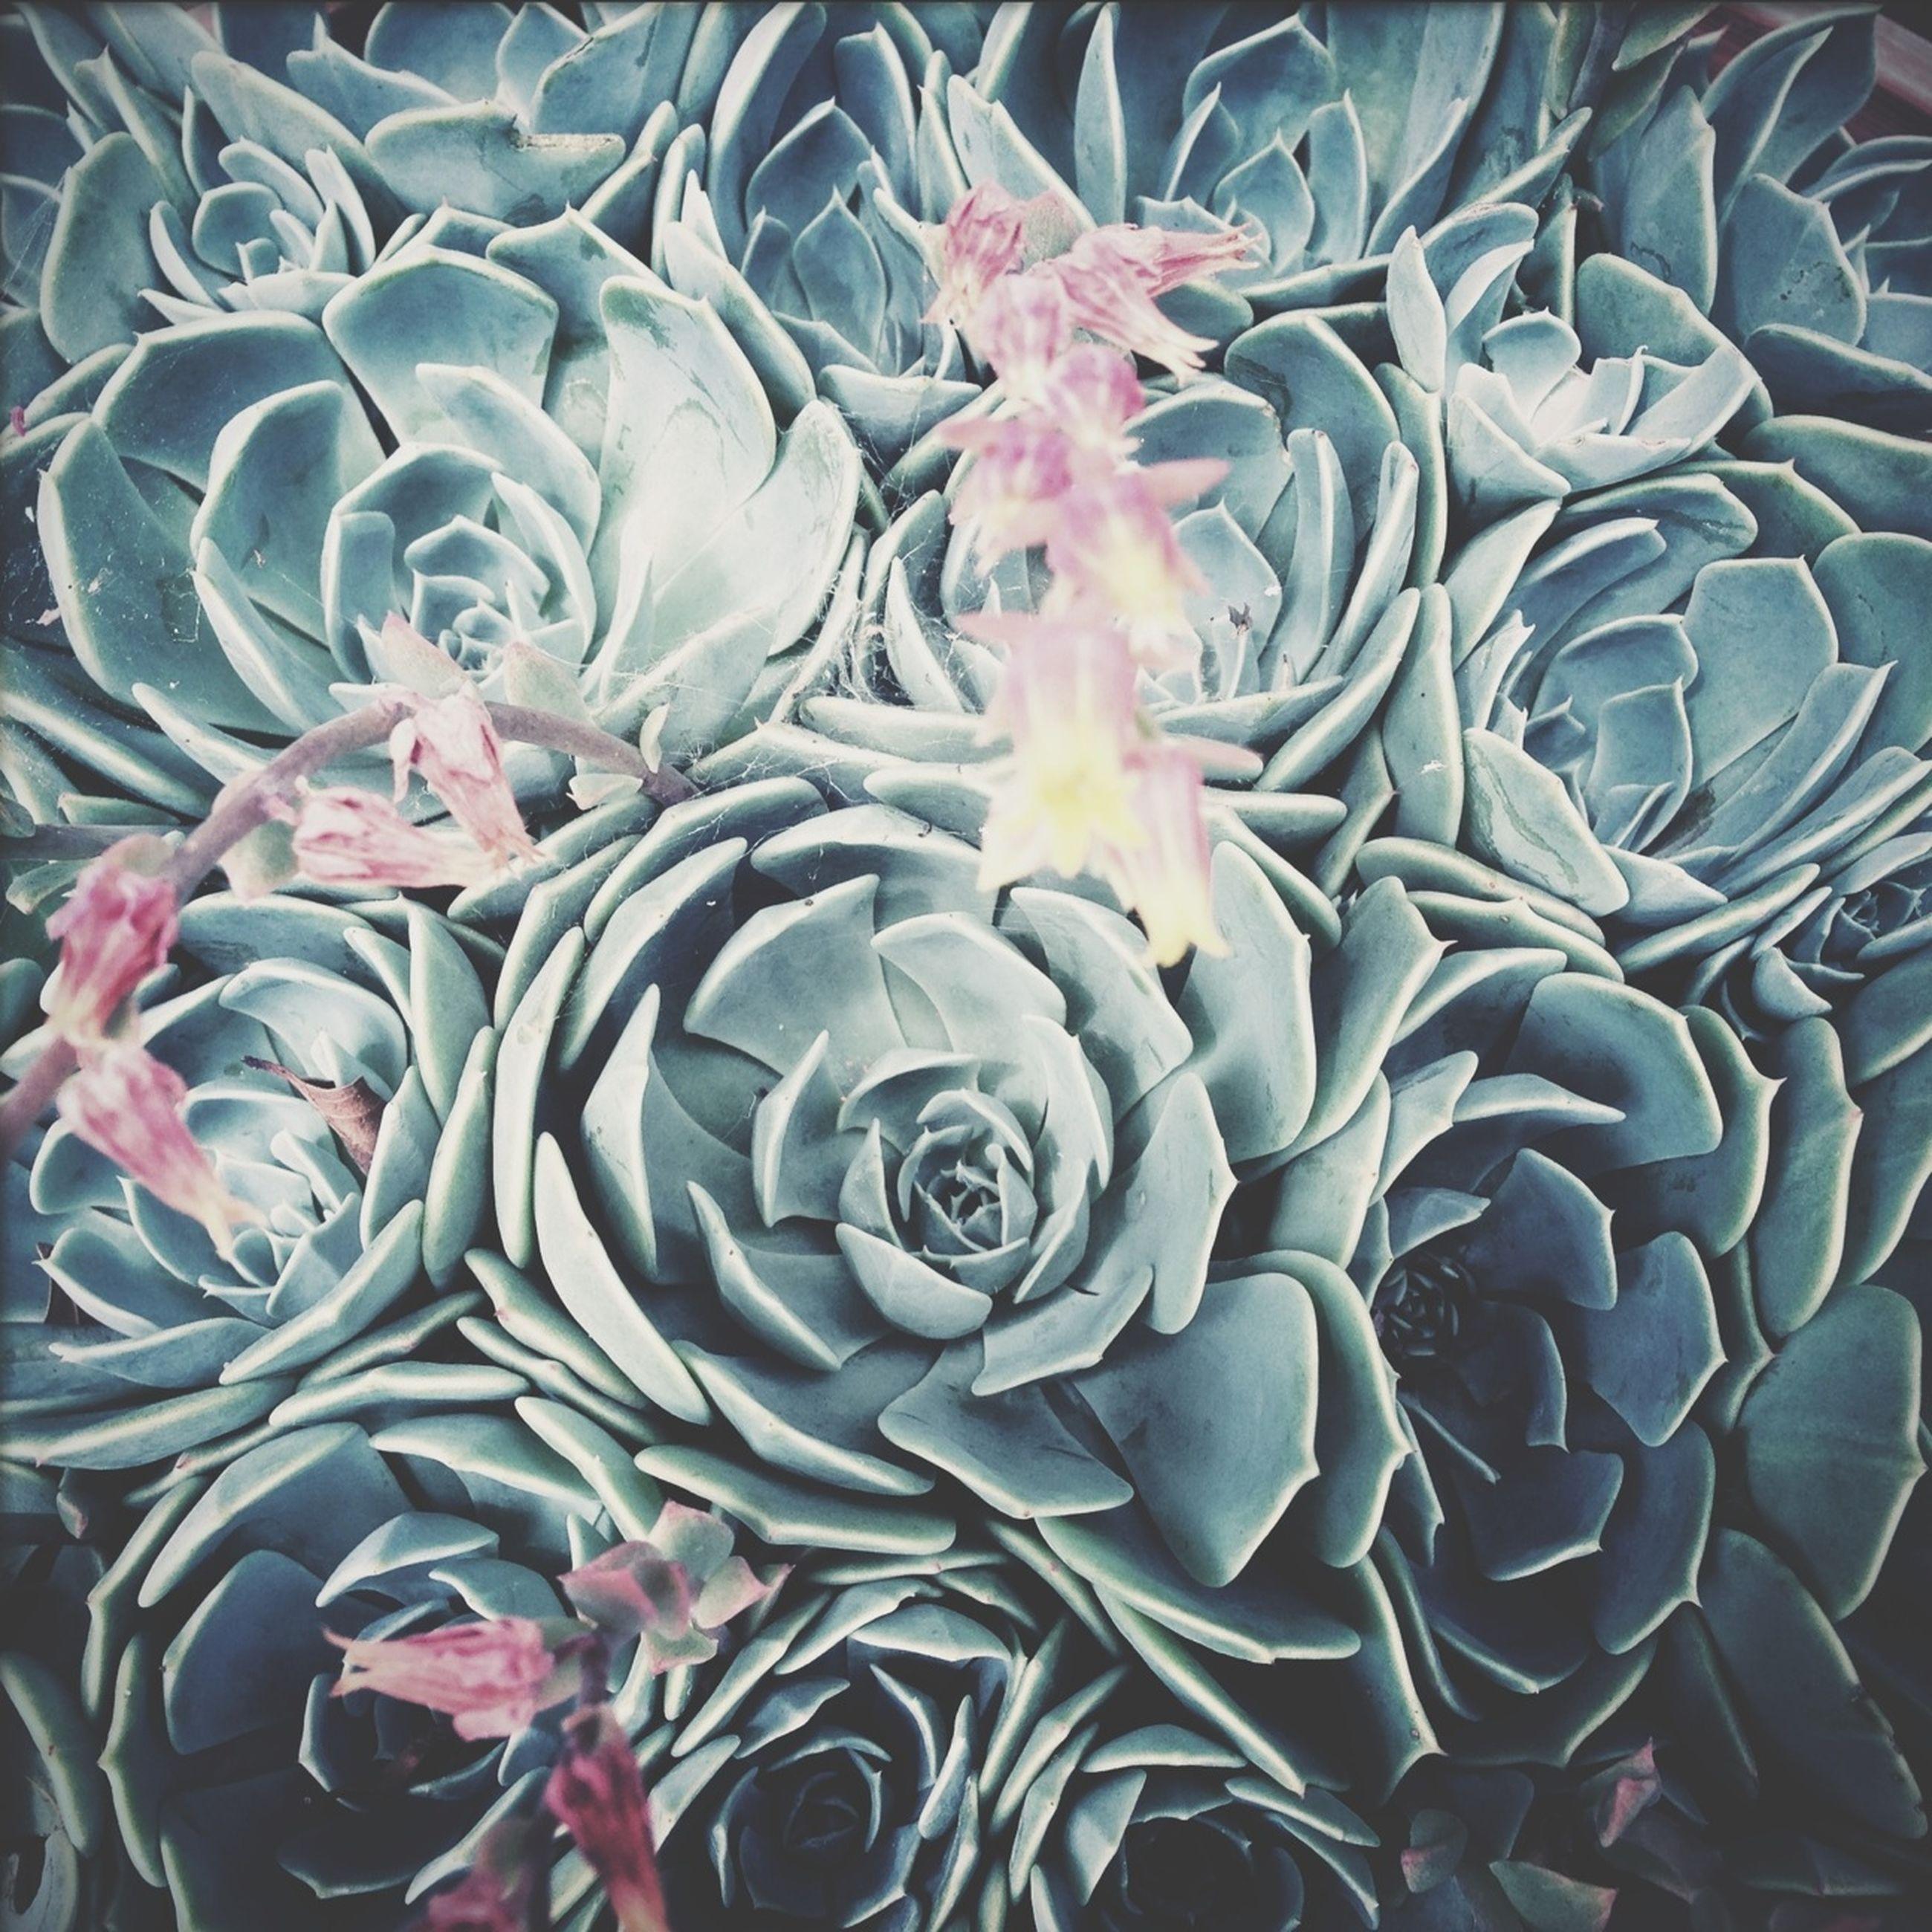 flower, full frame, indoors, backgrounds, decoration, fragility, pattern, multi colored, petal, design, pink color, freshness, variation, no people, rose - flower, plant, close-up, art and craft, nature, art